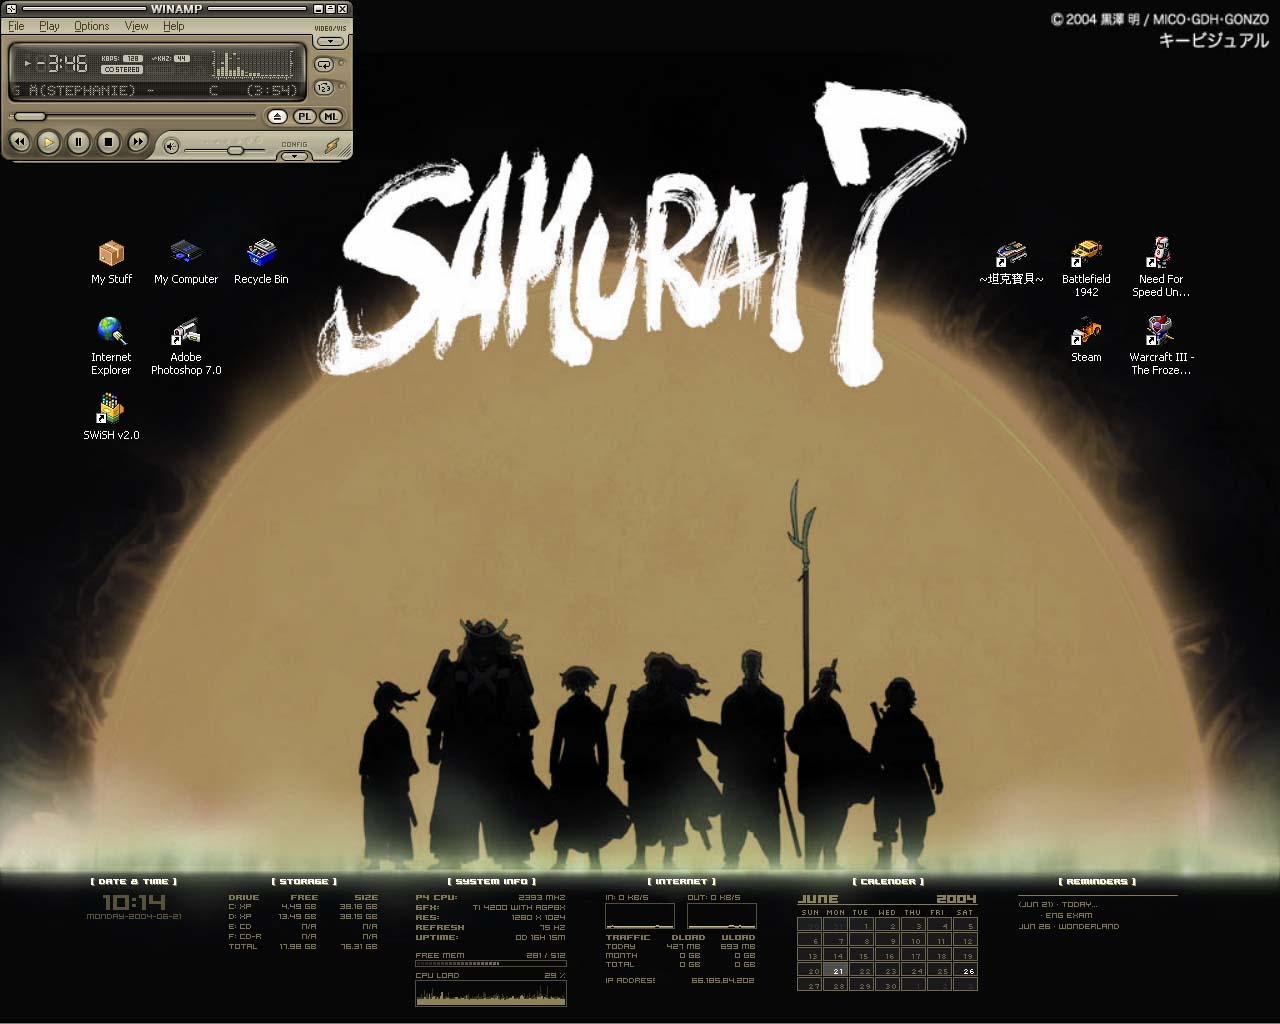 Title: samurai 7